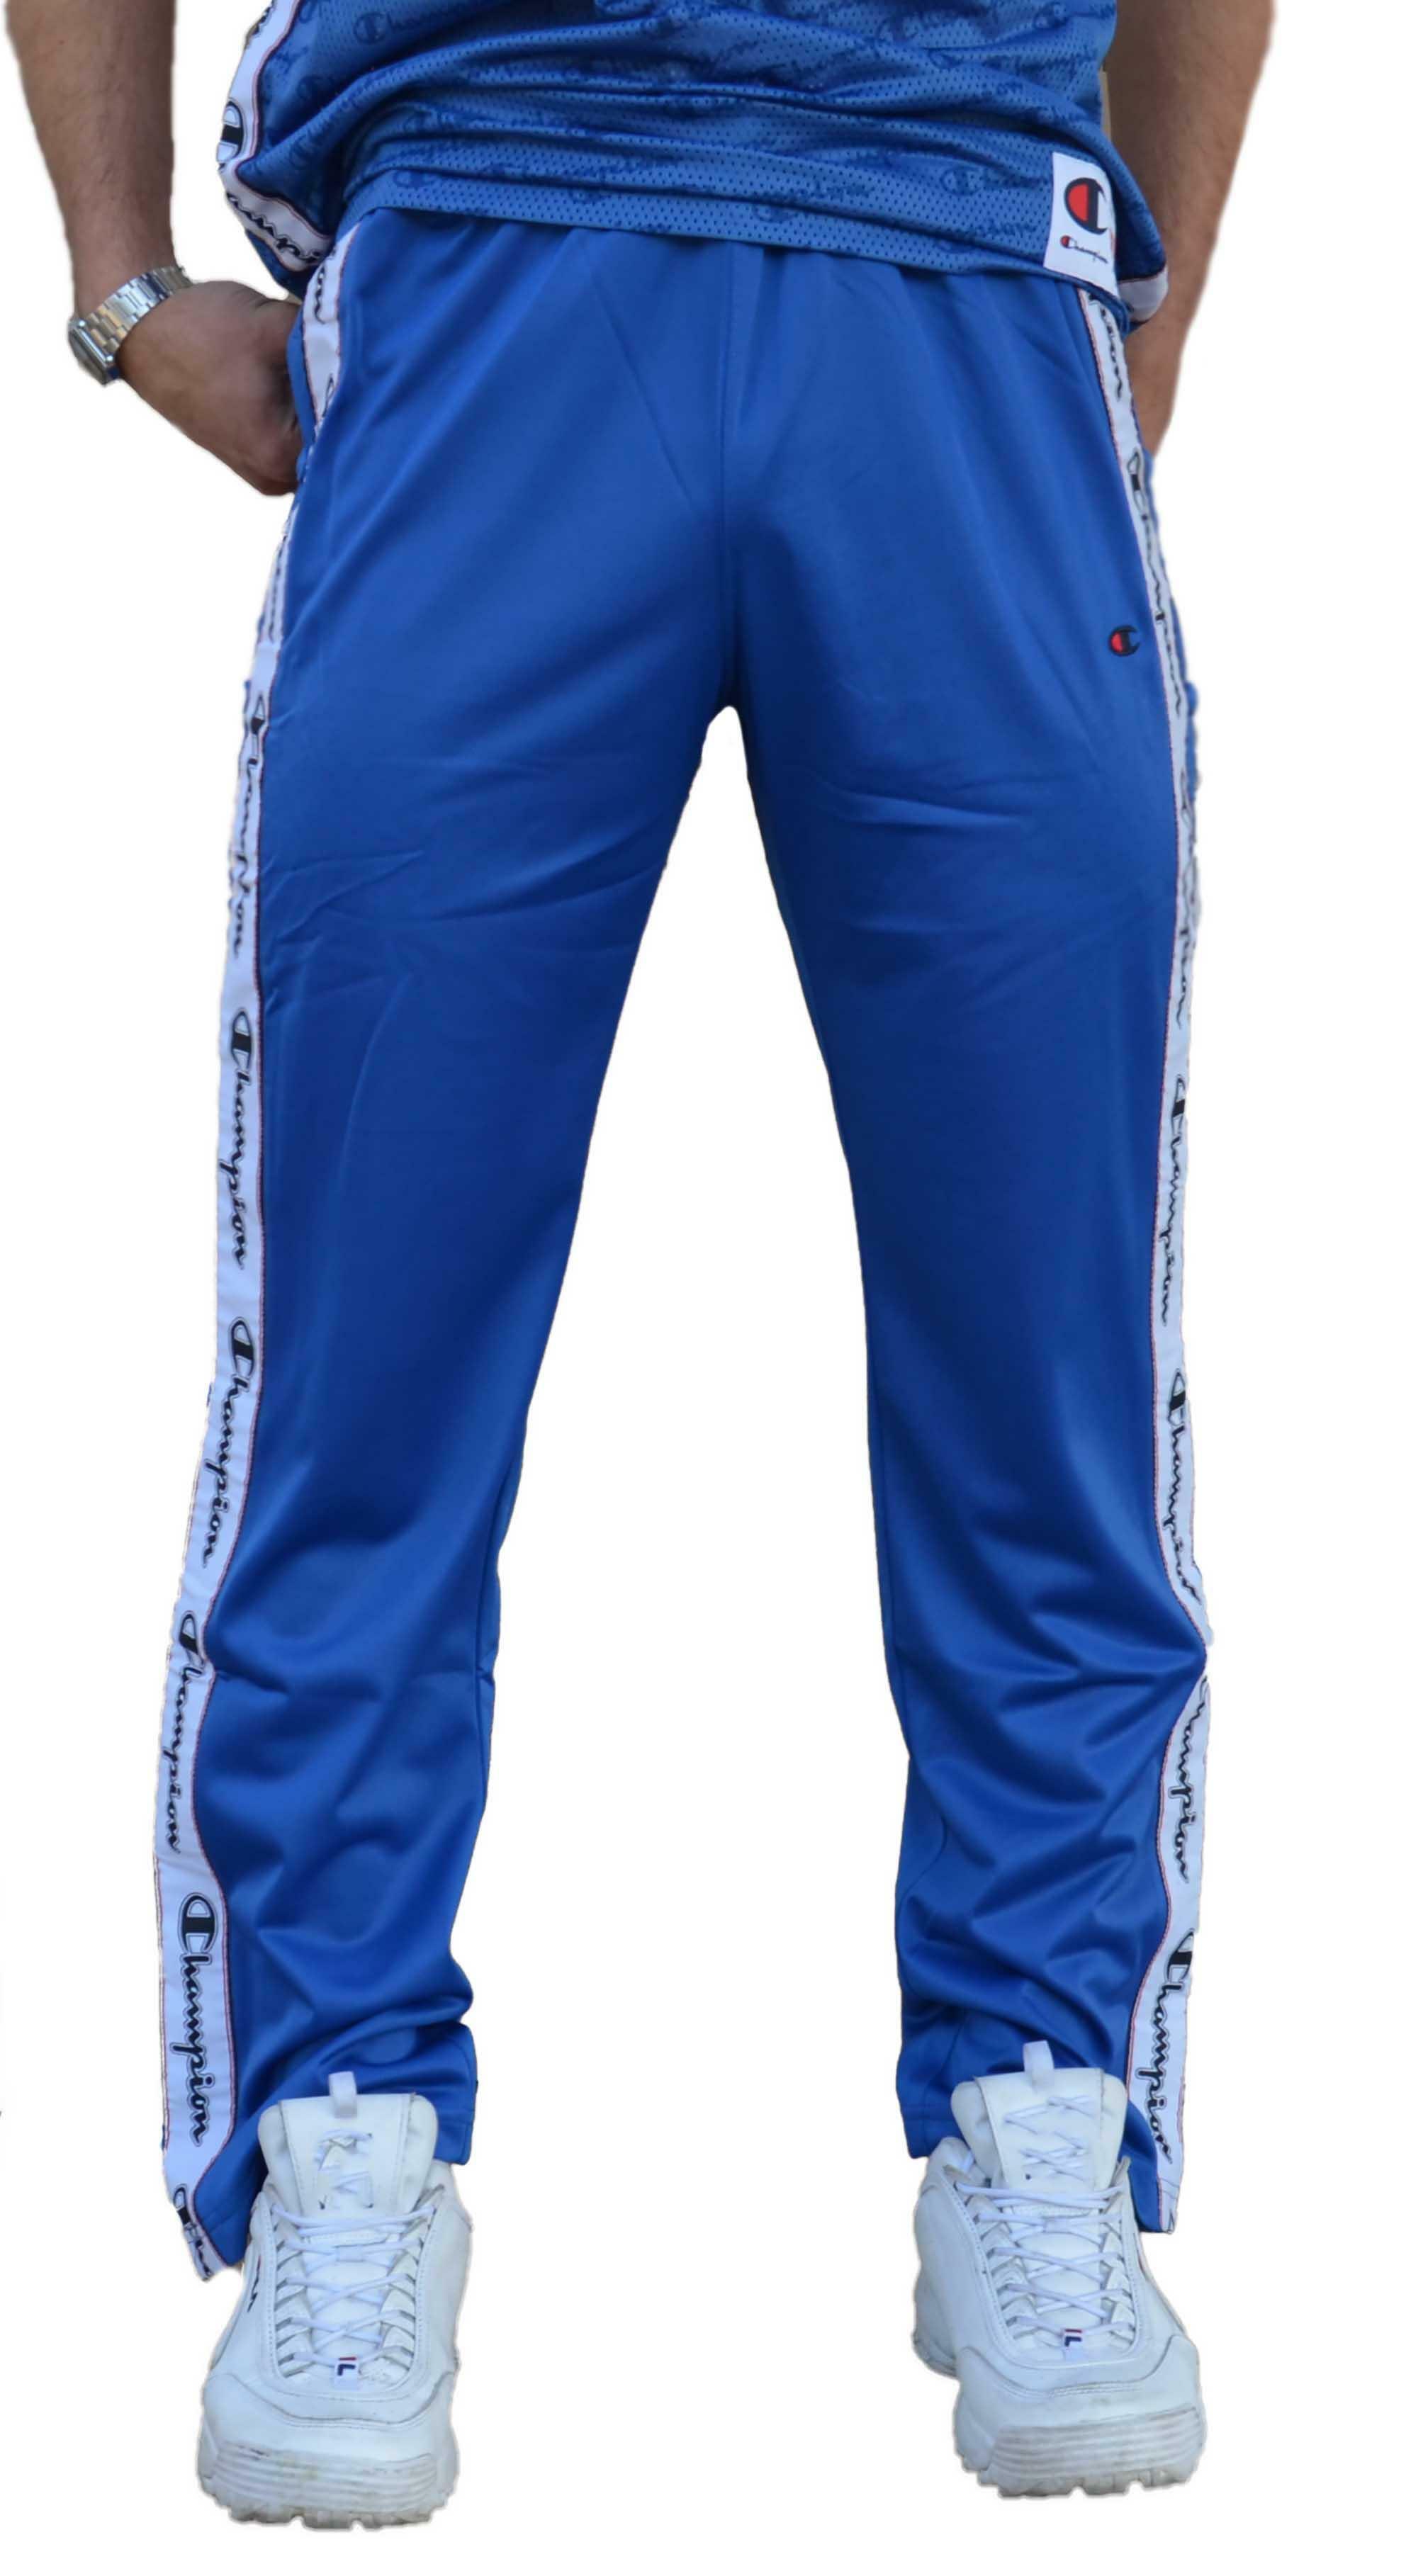 Uomo 213385bs023 Champion Pantaloni Azzurri 08nwNm